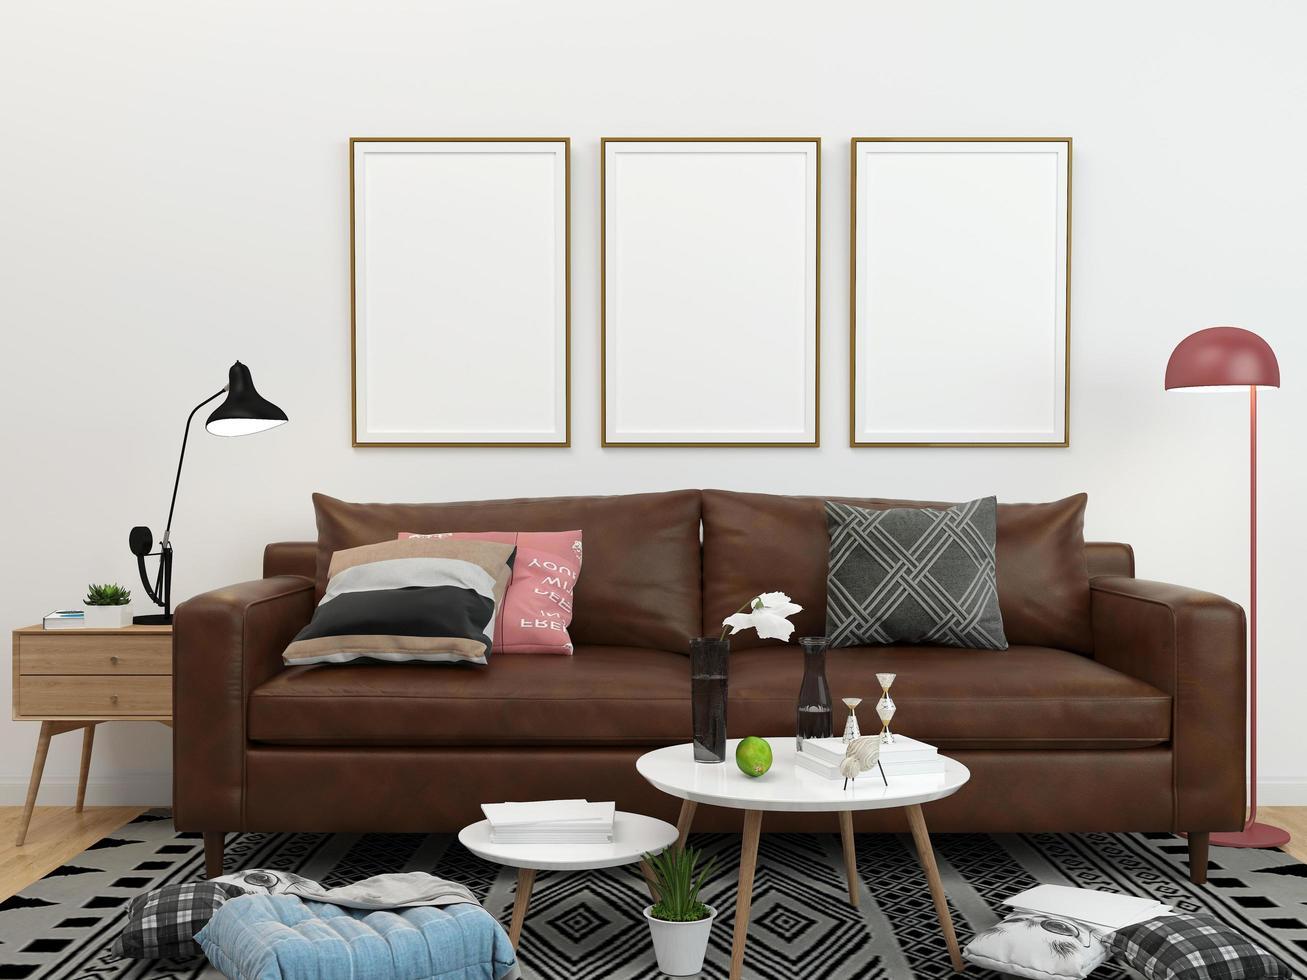 tres marcos vacíos en la sala de estar foto